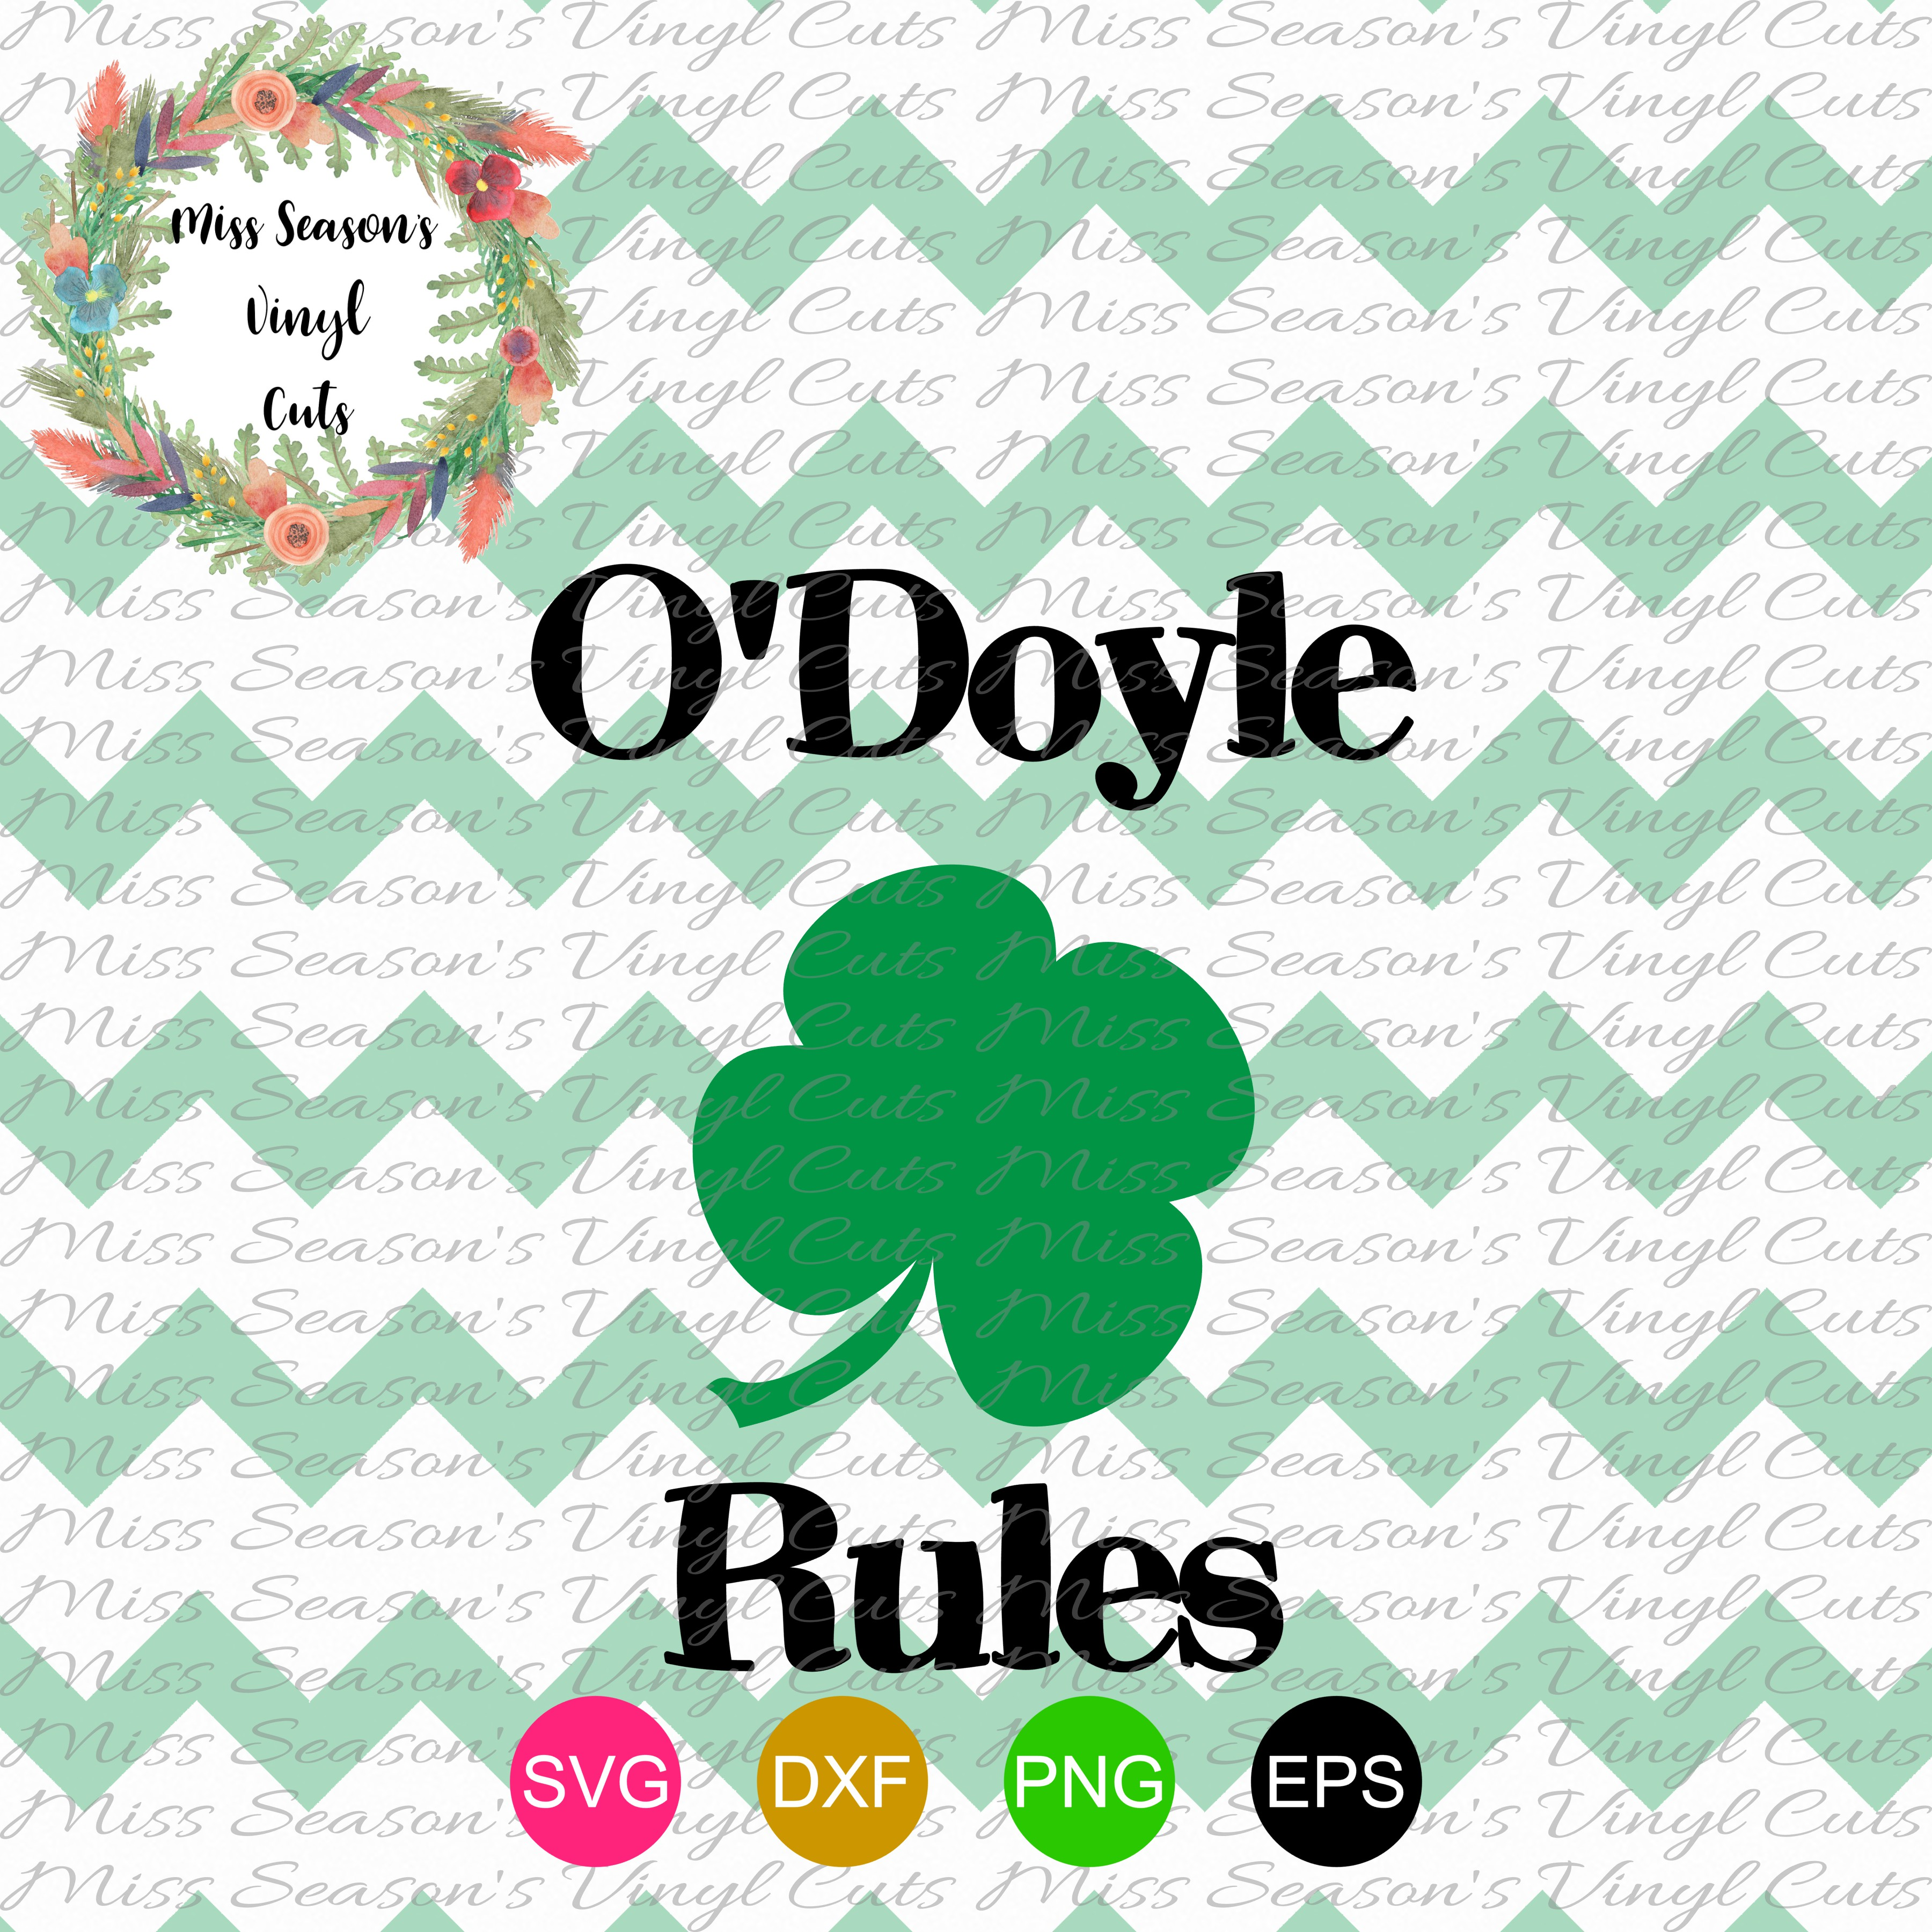 Odoyle Rules SVG  example image 1